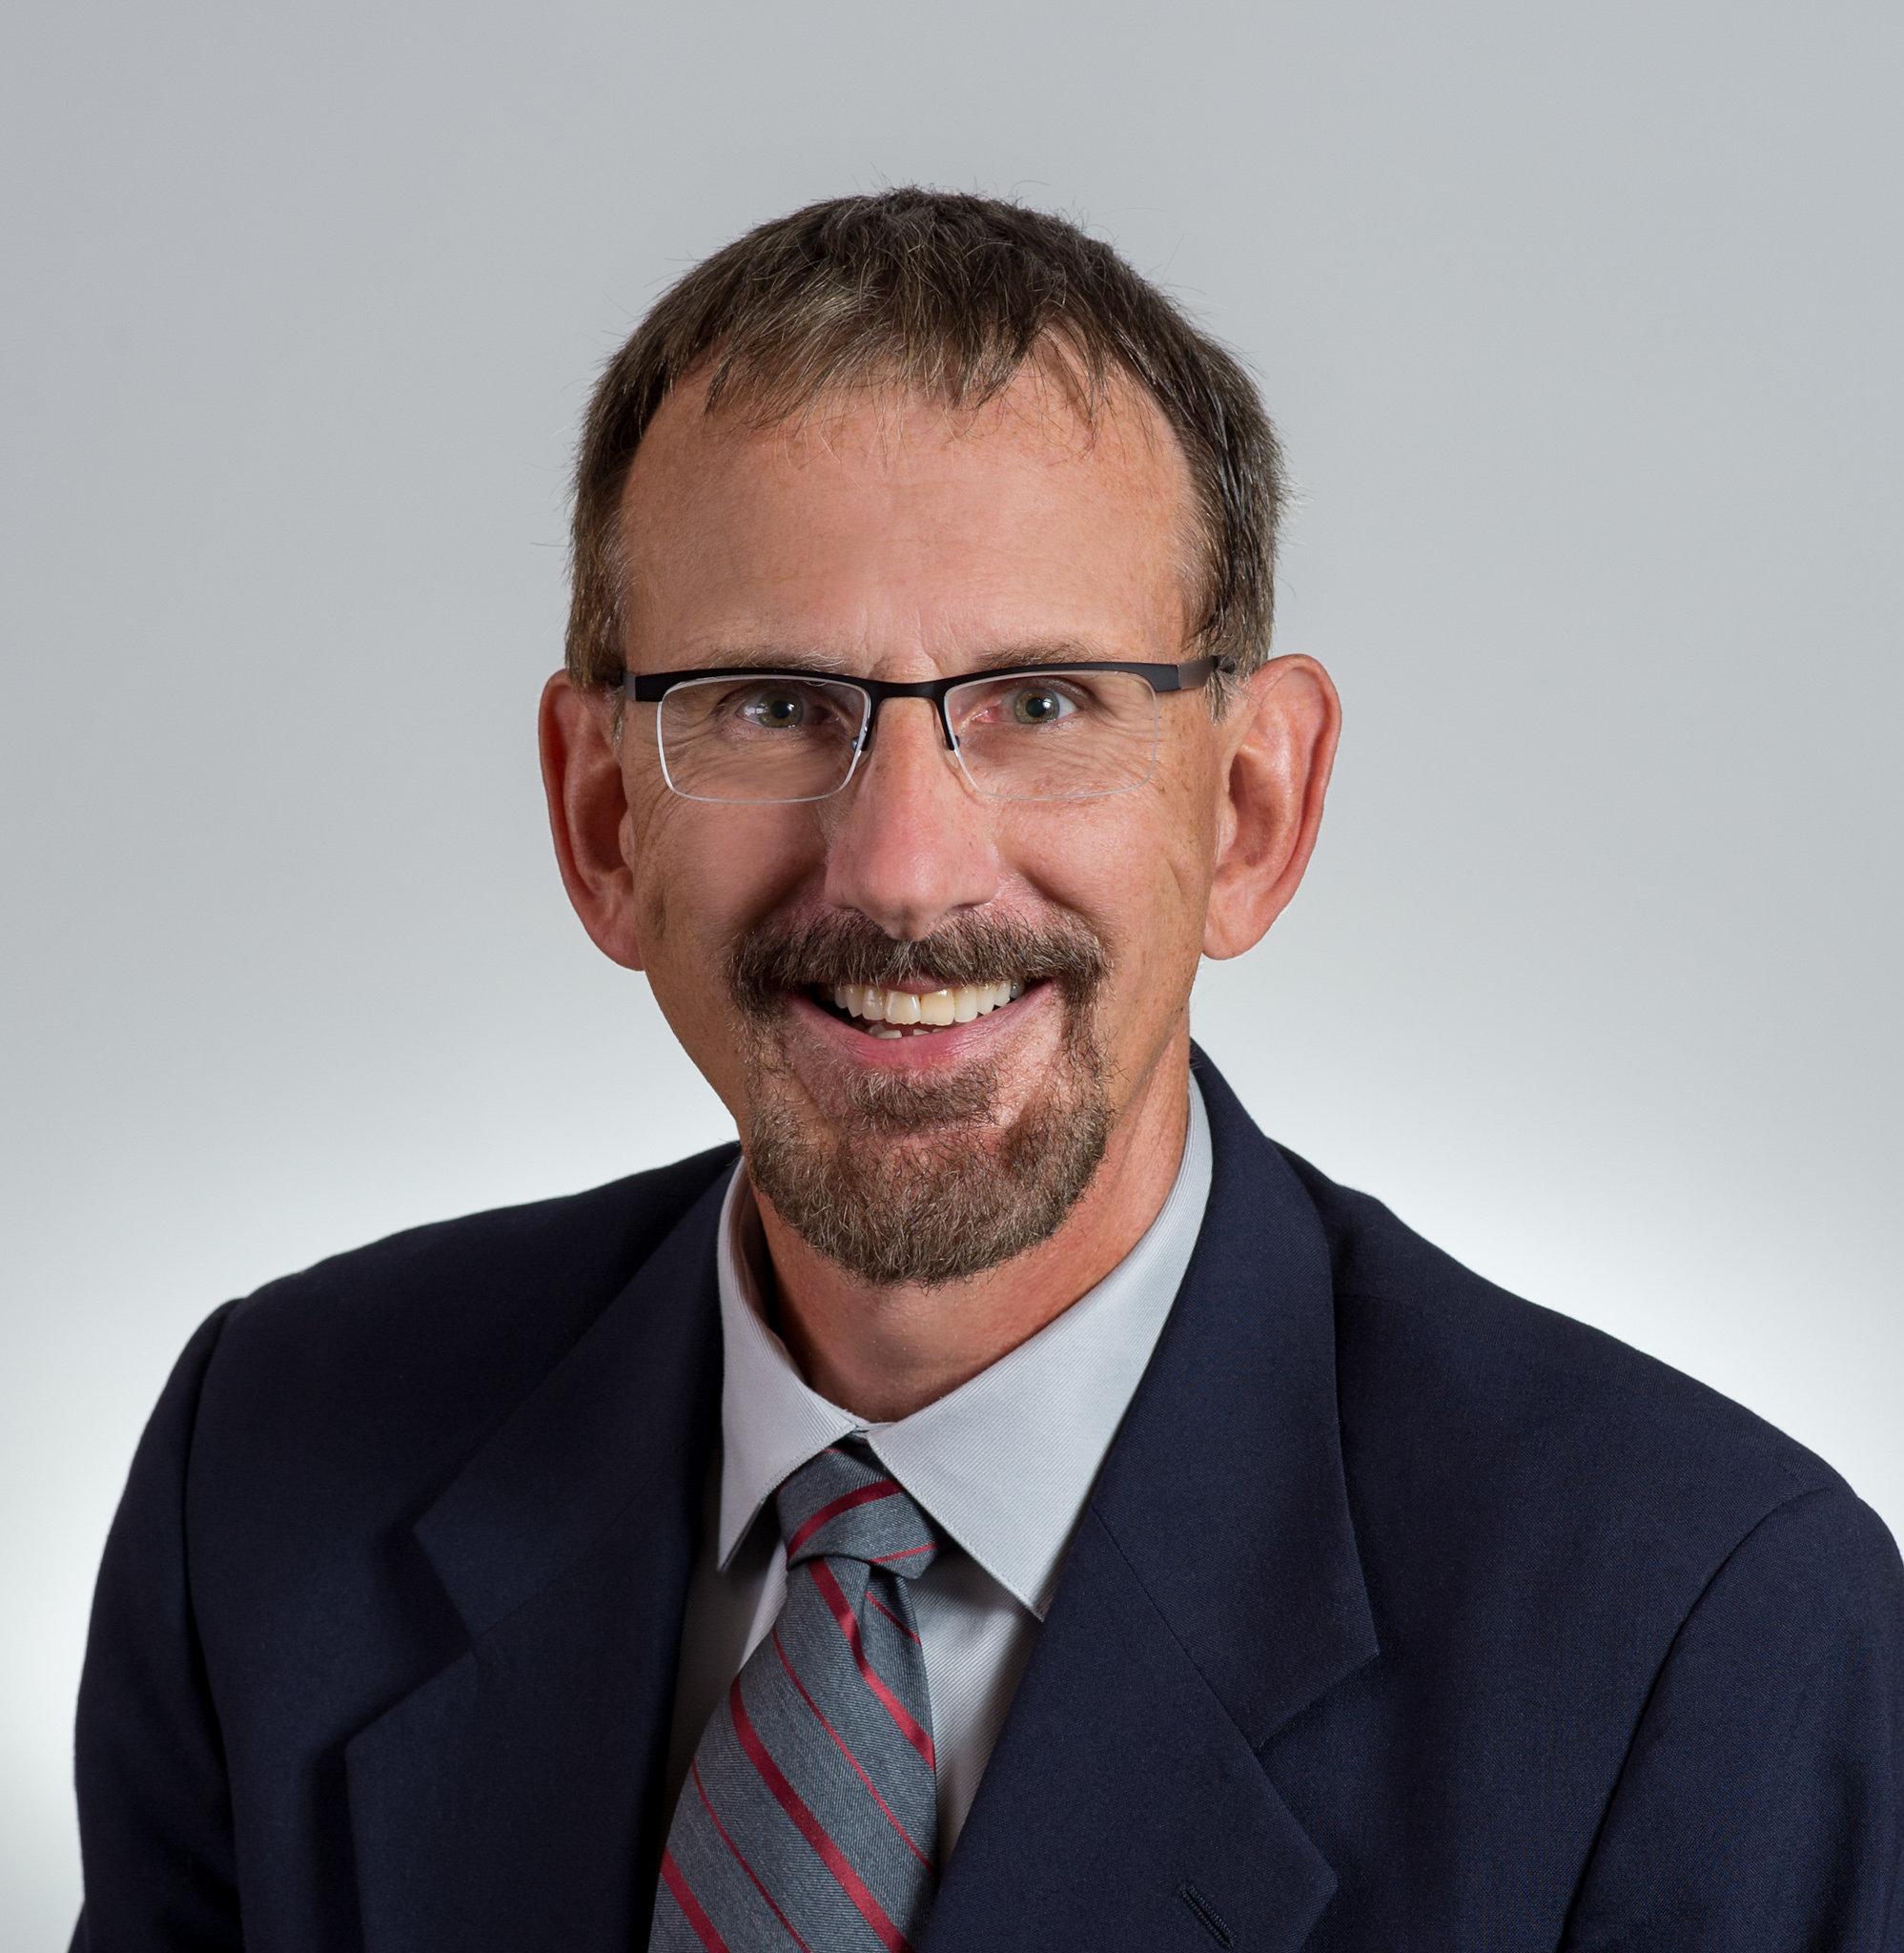 Jeff Sieloff